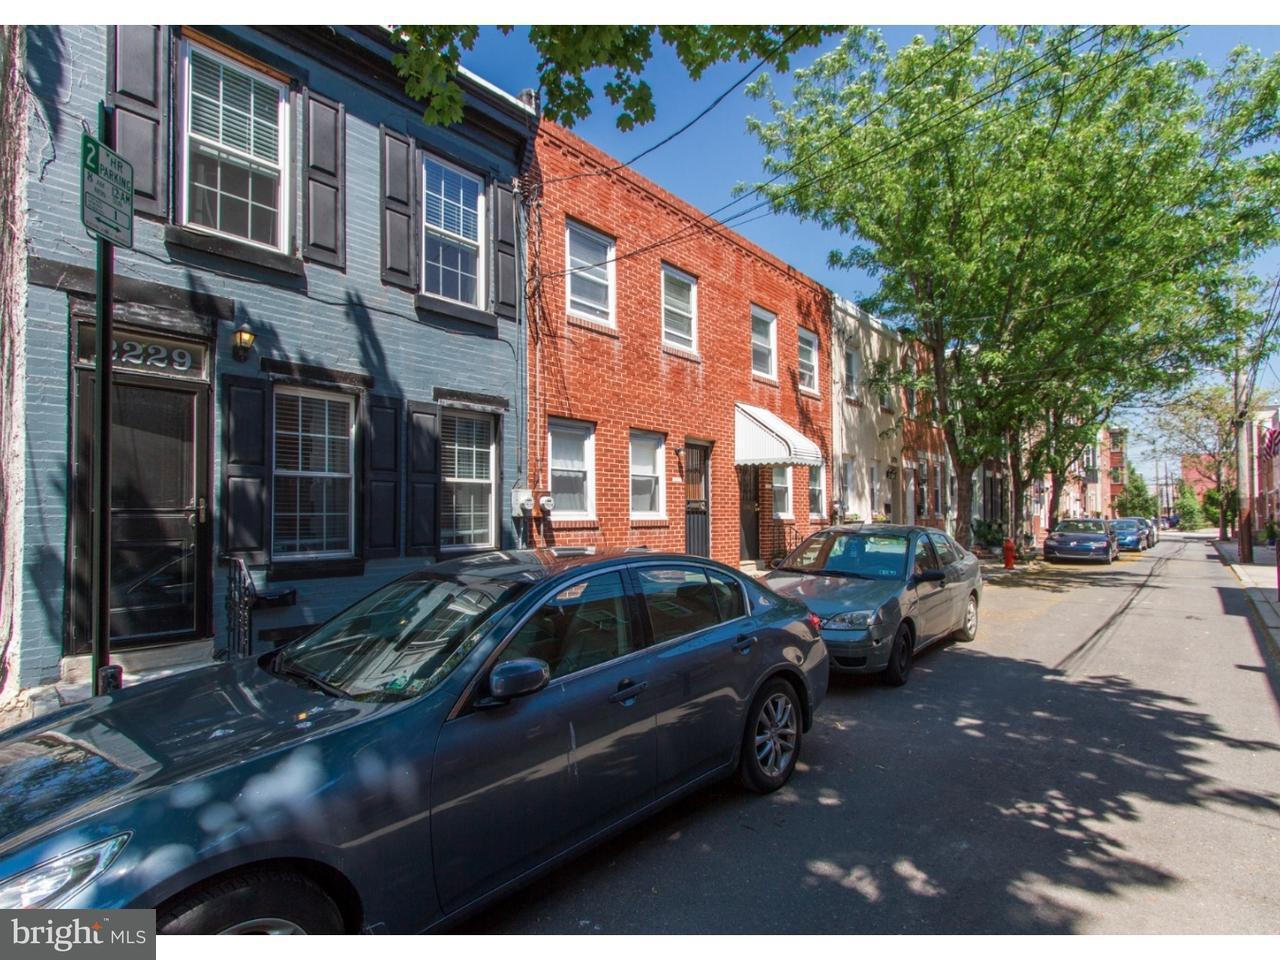 2229 Kimball Street Philadelphia, PA 19146